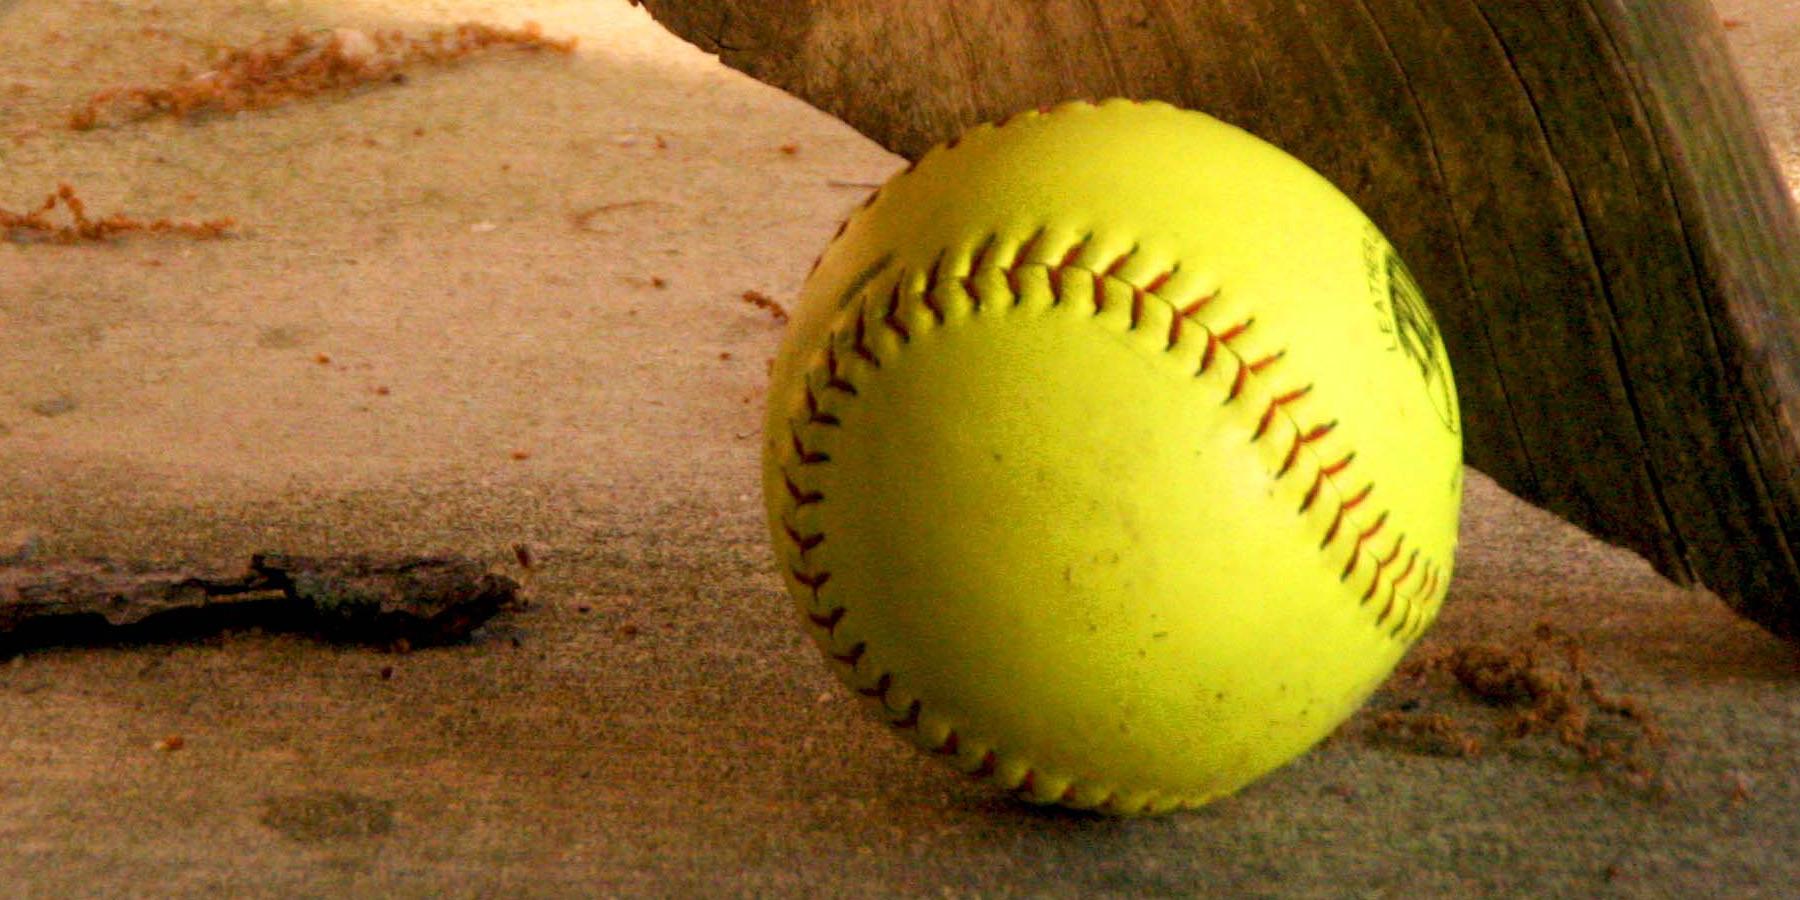 Amateur softball assoc sorry, that has